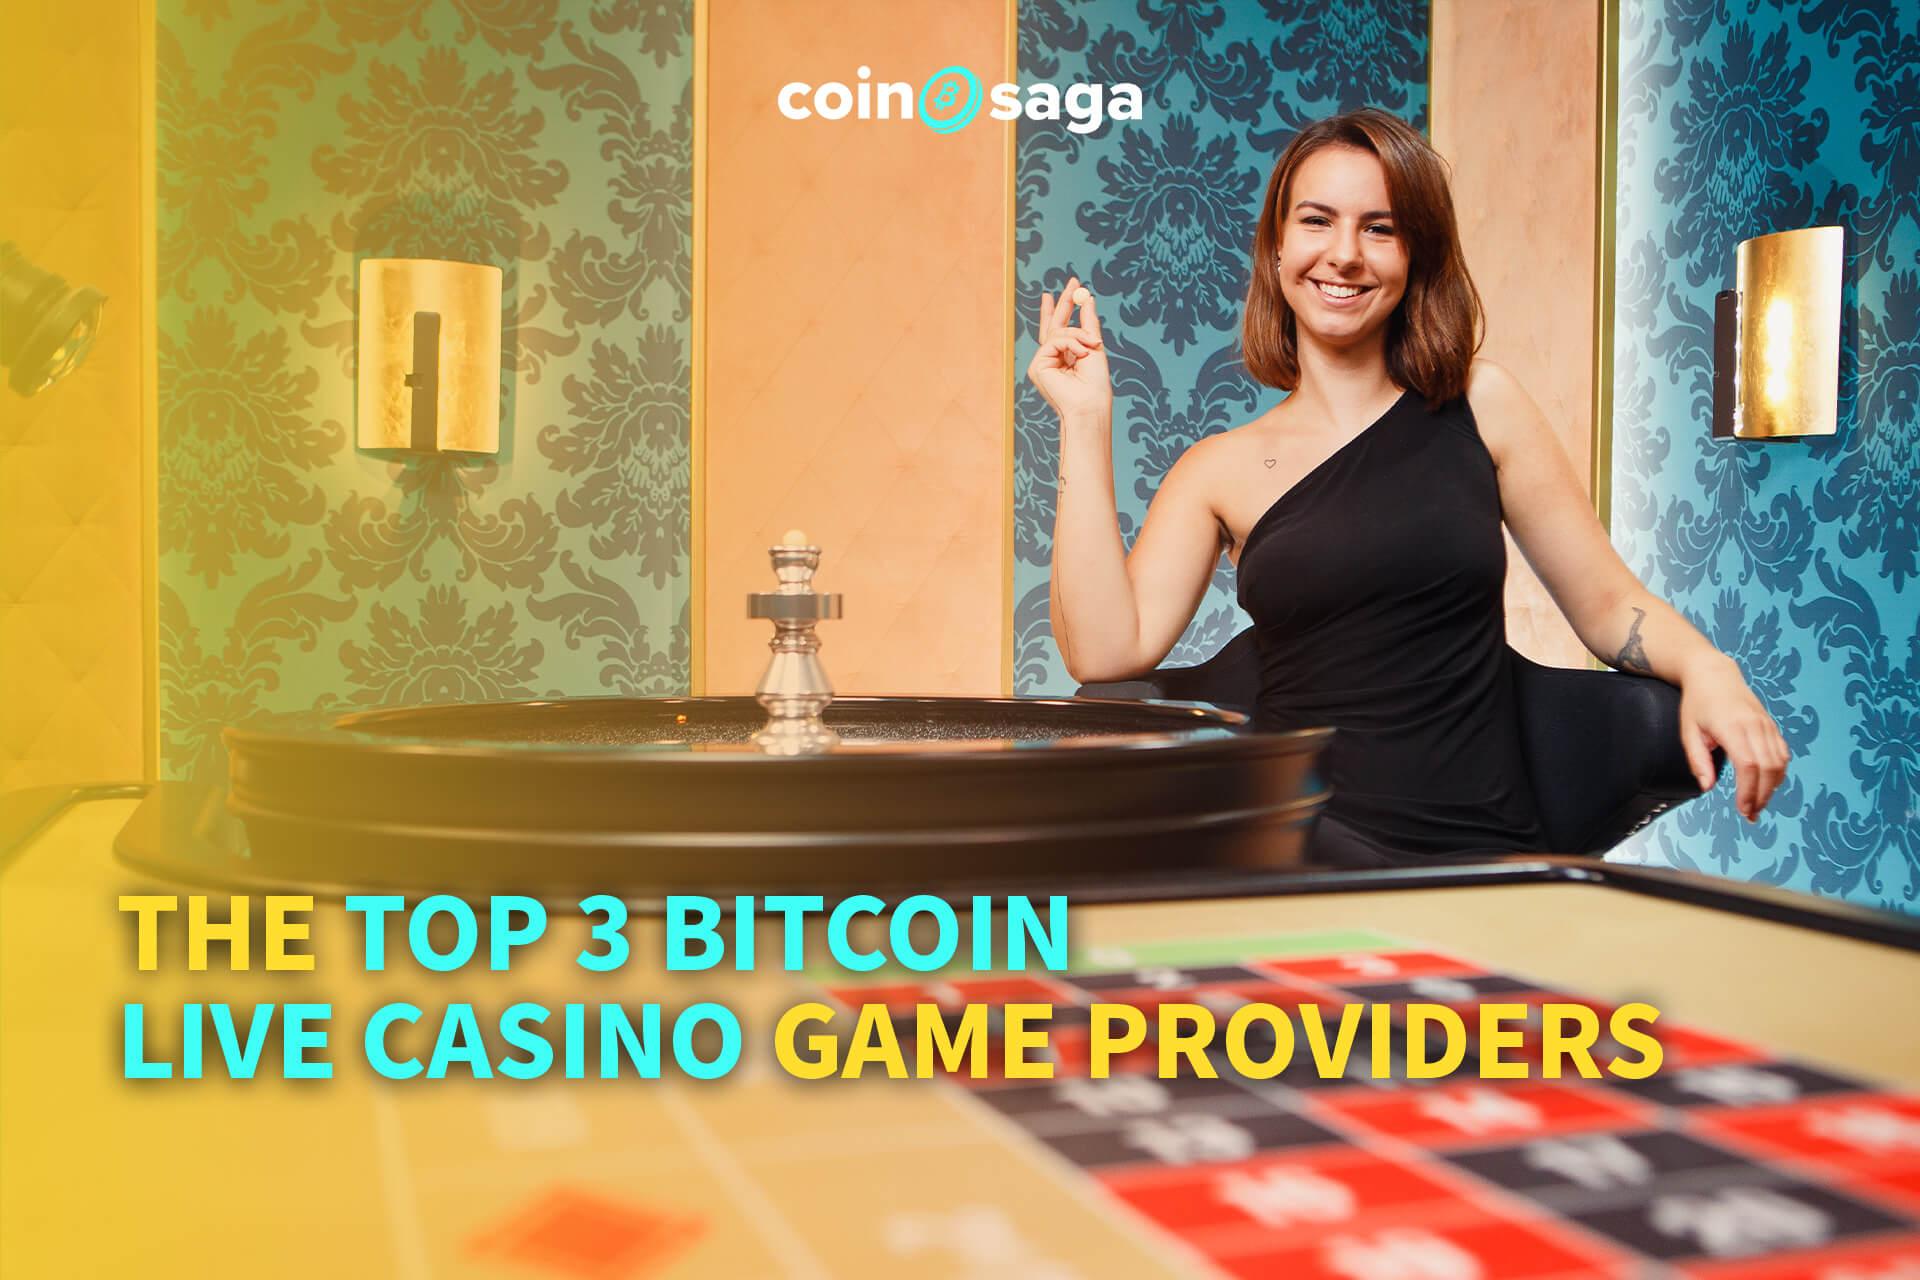 Top 3 Bitcoin Live Casino Providers.jpg